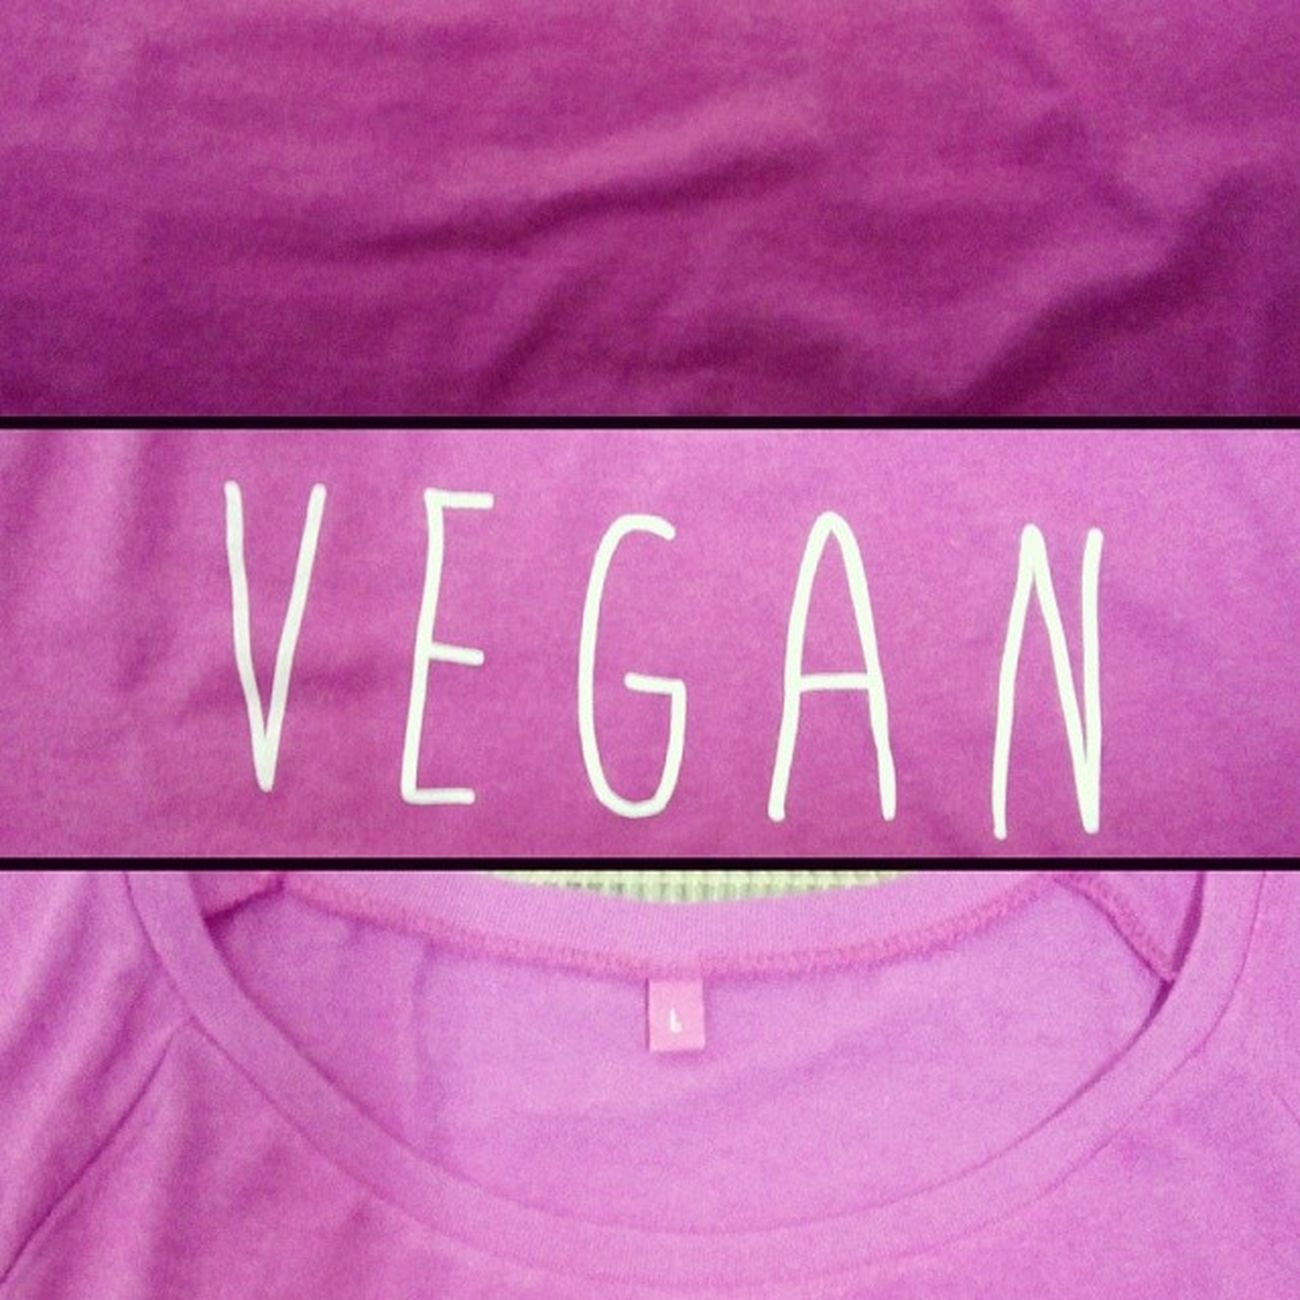 #vegan #veganfashion #bambù #chiaralascura #vegantshirt #biologico #organic #veganfortheanimals Vegan Organic Bambu Chiaralascura Vegantshirt Veganfashion Biologico Veganfortheanimals